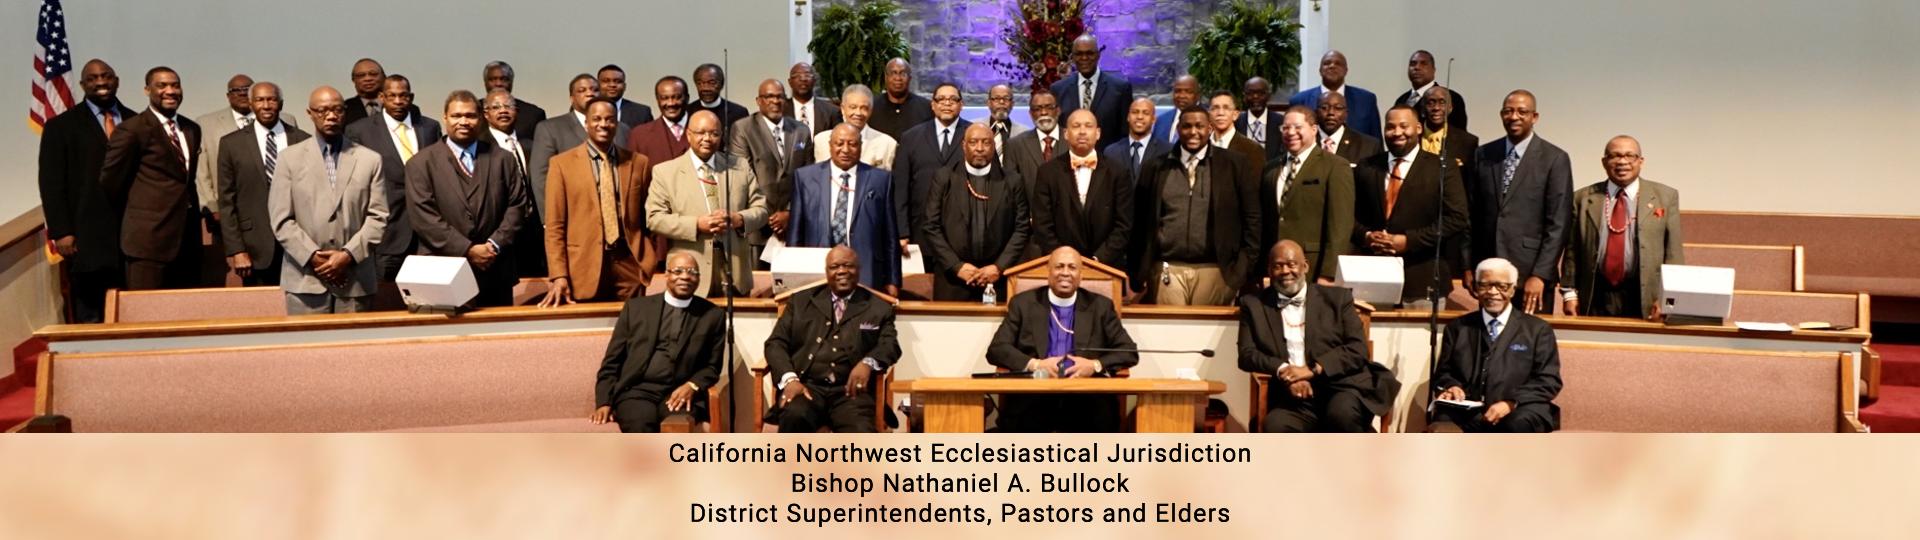 Superintenent and District Pastors